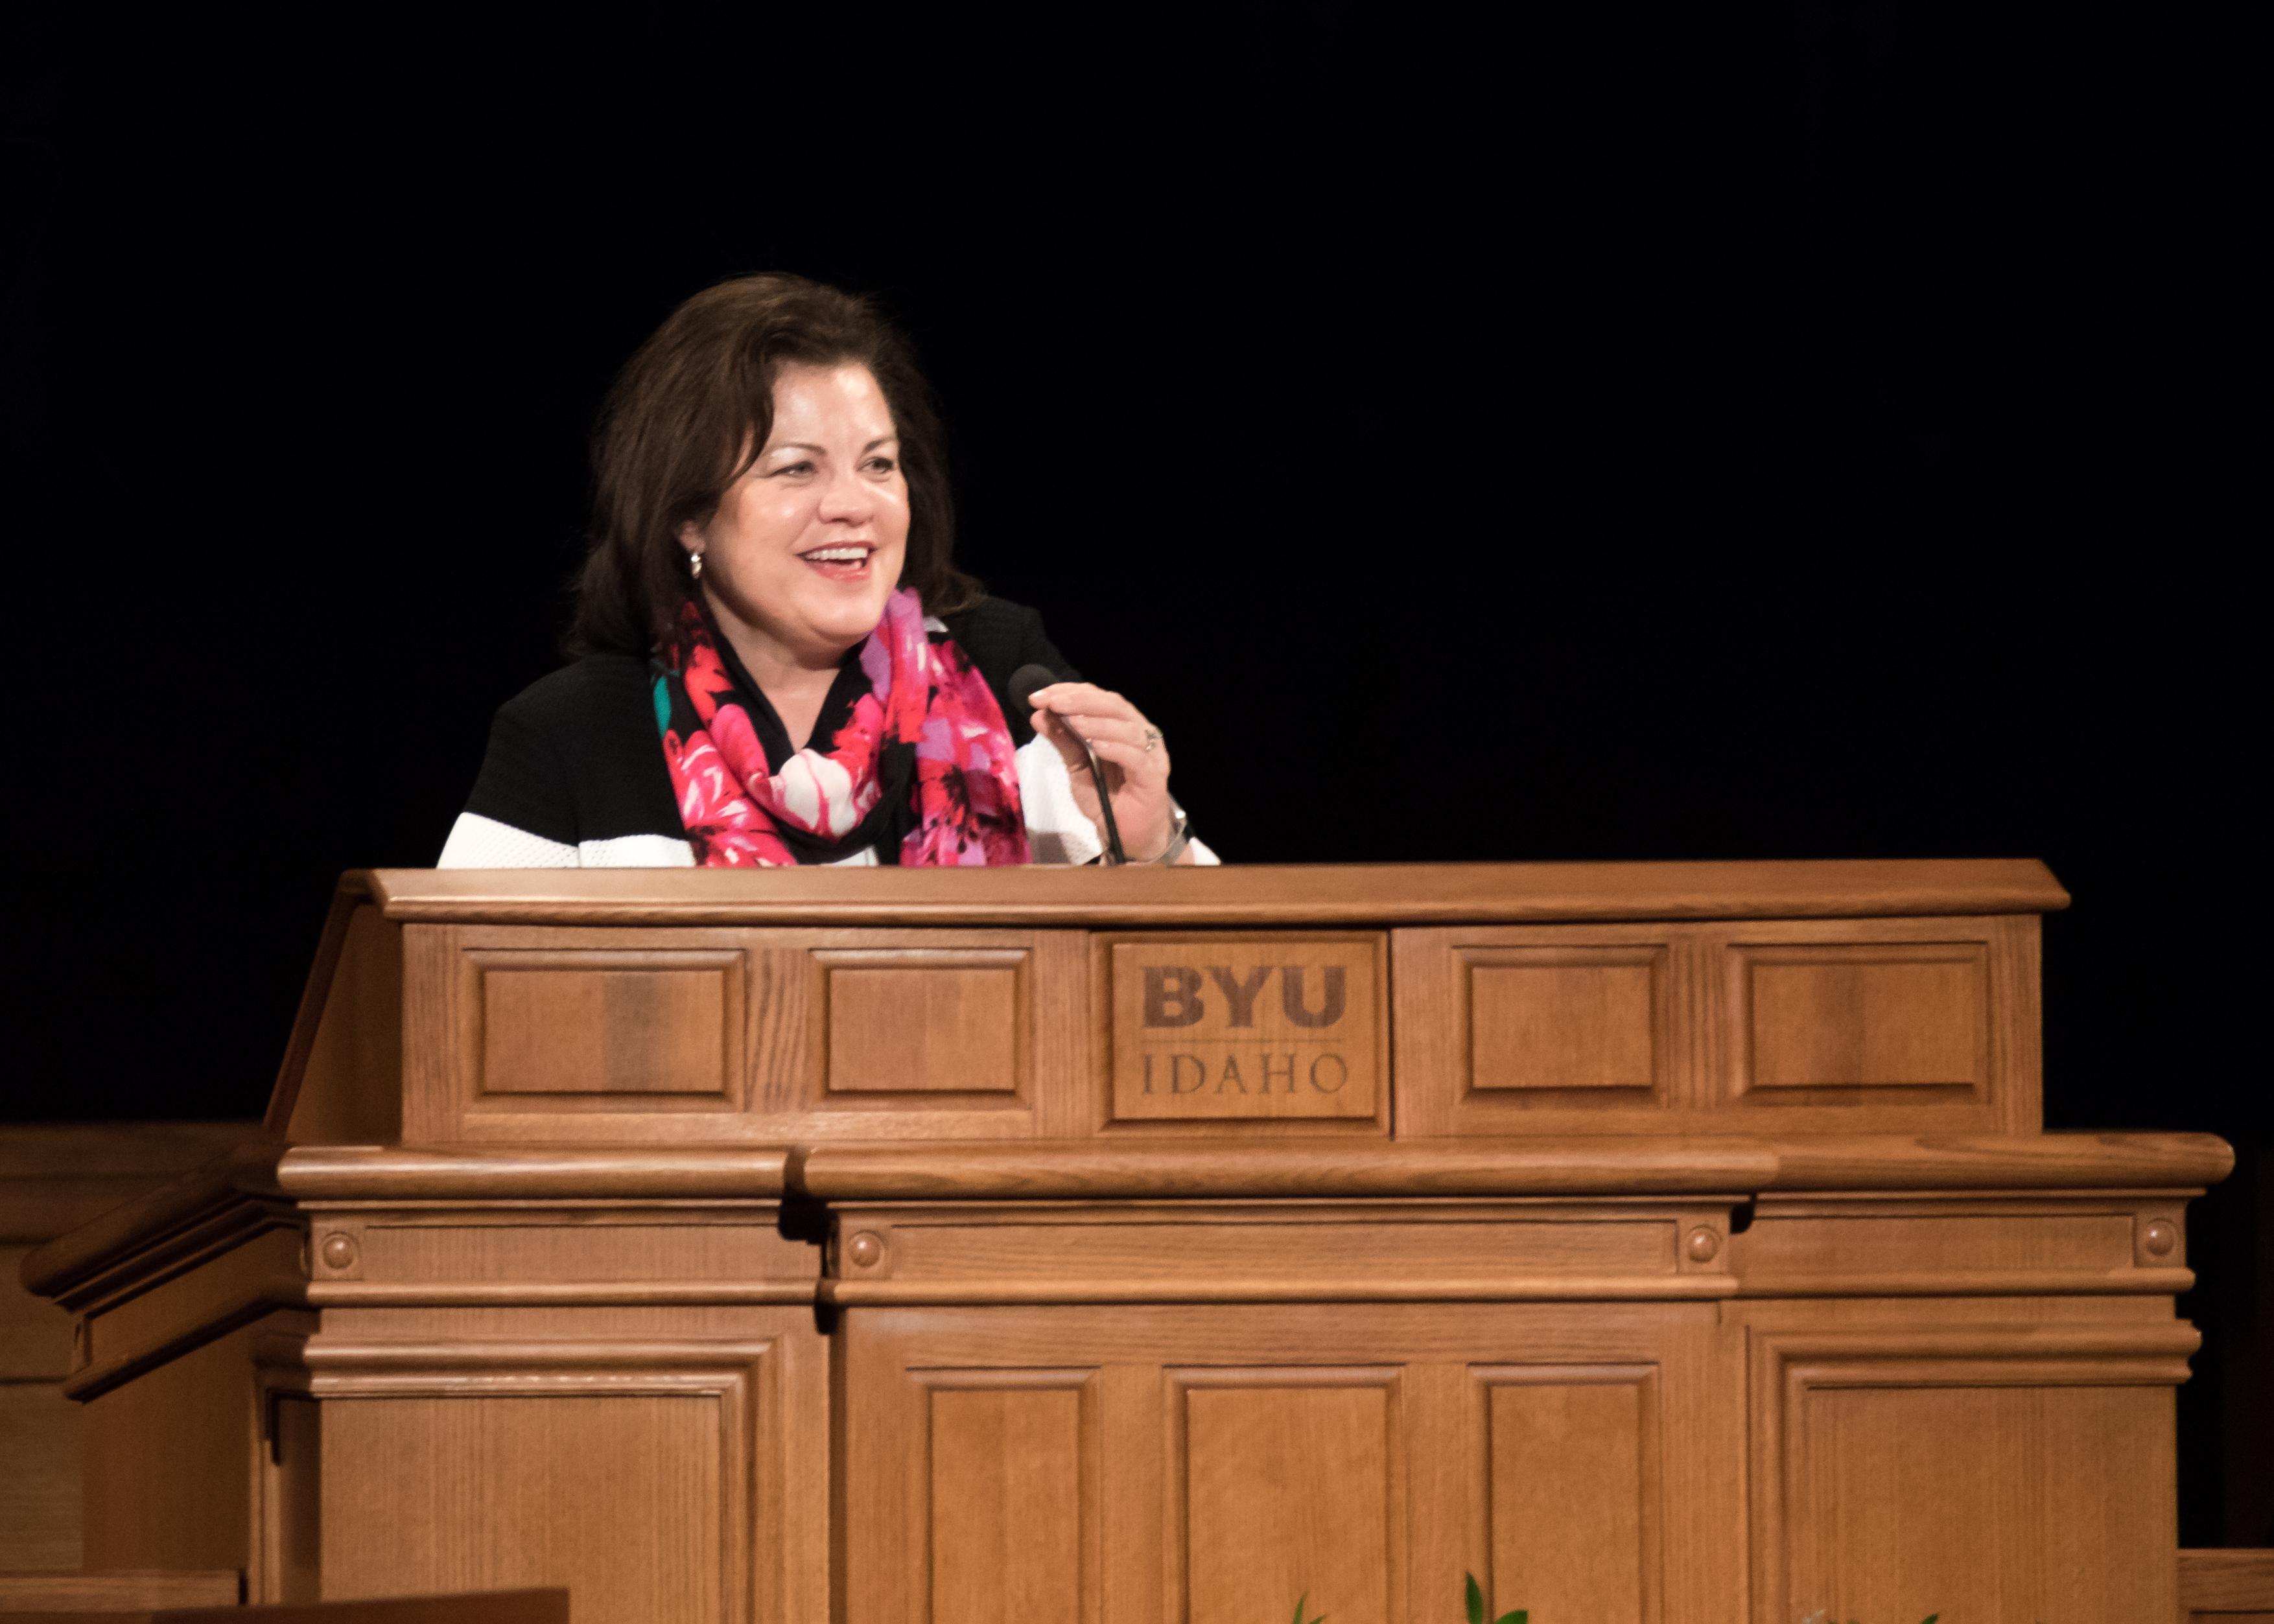 Sister Melanie Rasband speaks during a devotional held in the BYU-Idaho Center on April 28, 2019.